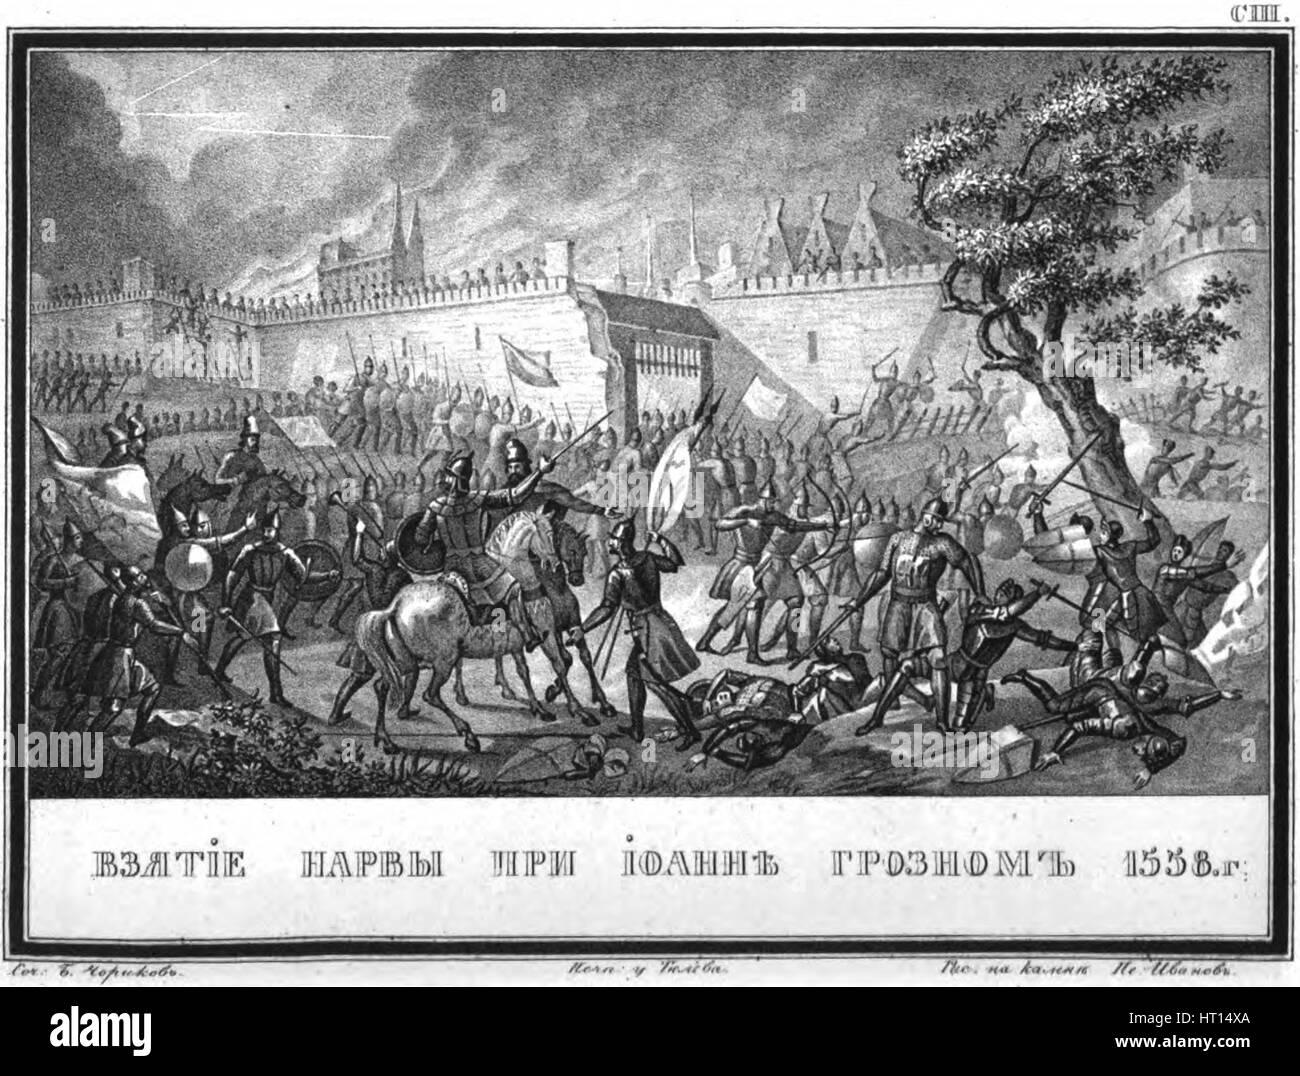 The Russian Army capturing Narva on May 11, 1558 (From Illustrated Karamzin), 1836. Artist: Chorikov, Boris Artemyevich - Stock Image